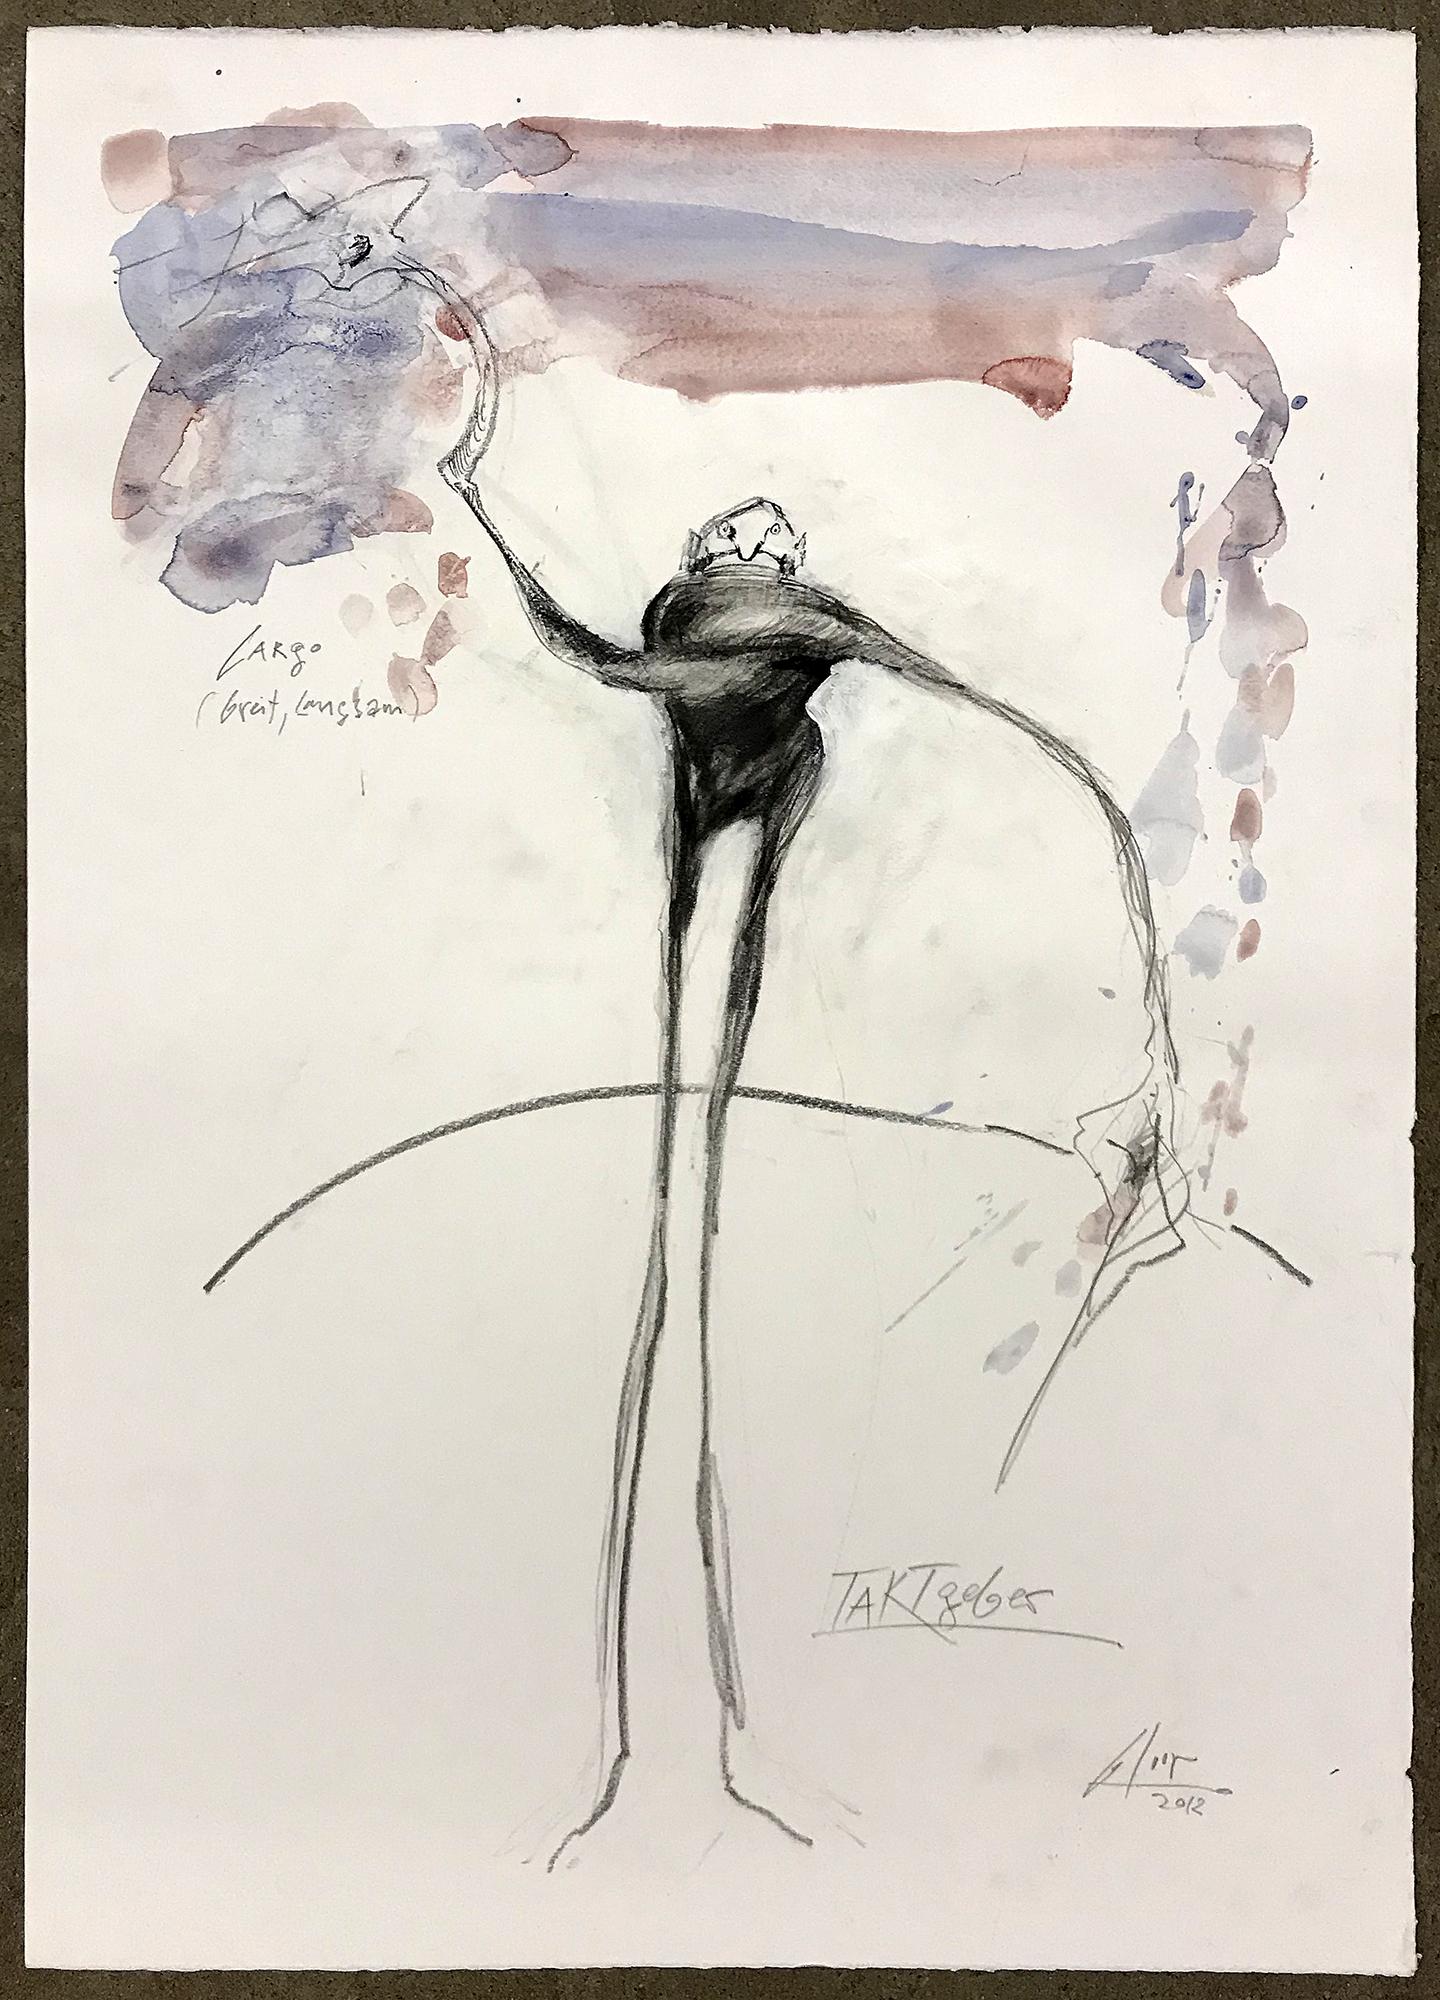 Taktgeber / Largo, 2012, Mischtechnik auf Büttenpapier, ca. 40 x 60, ohne Rahmen